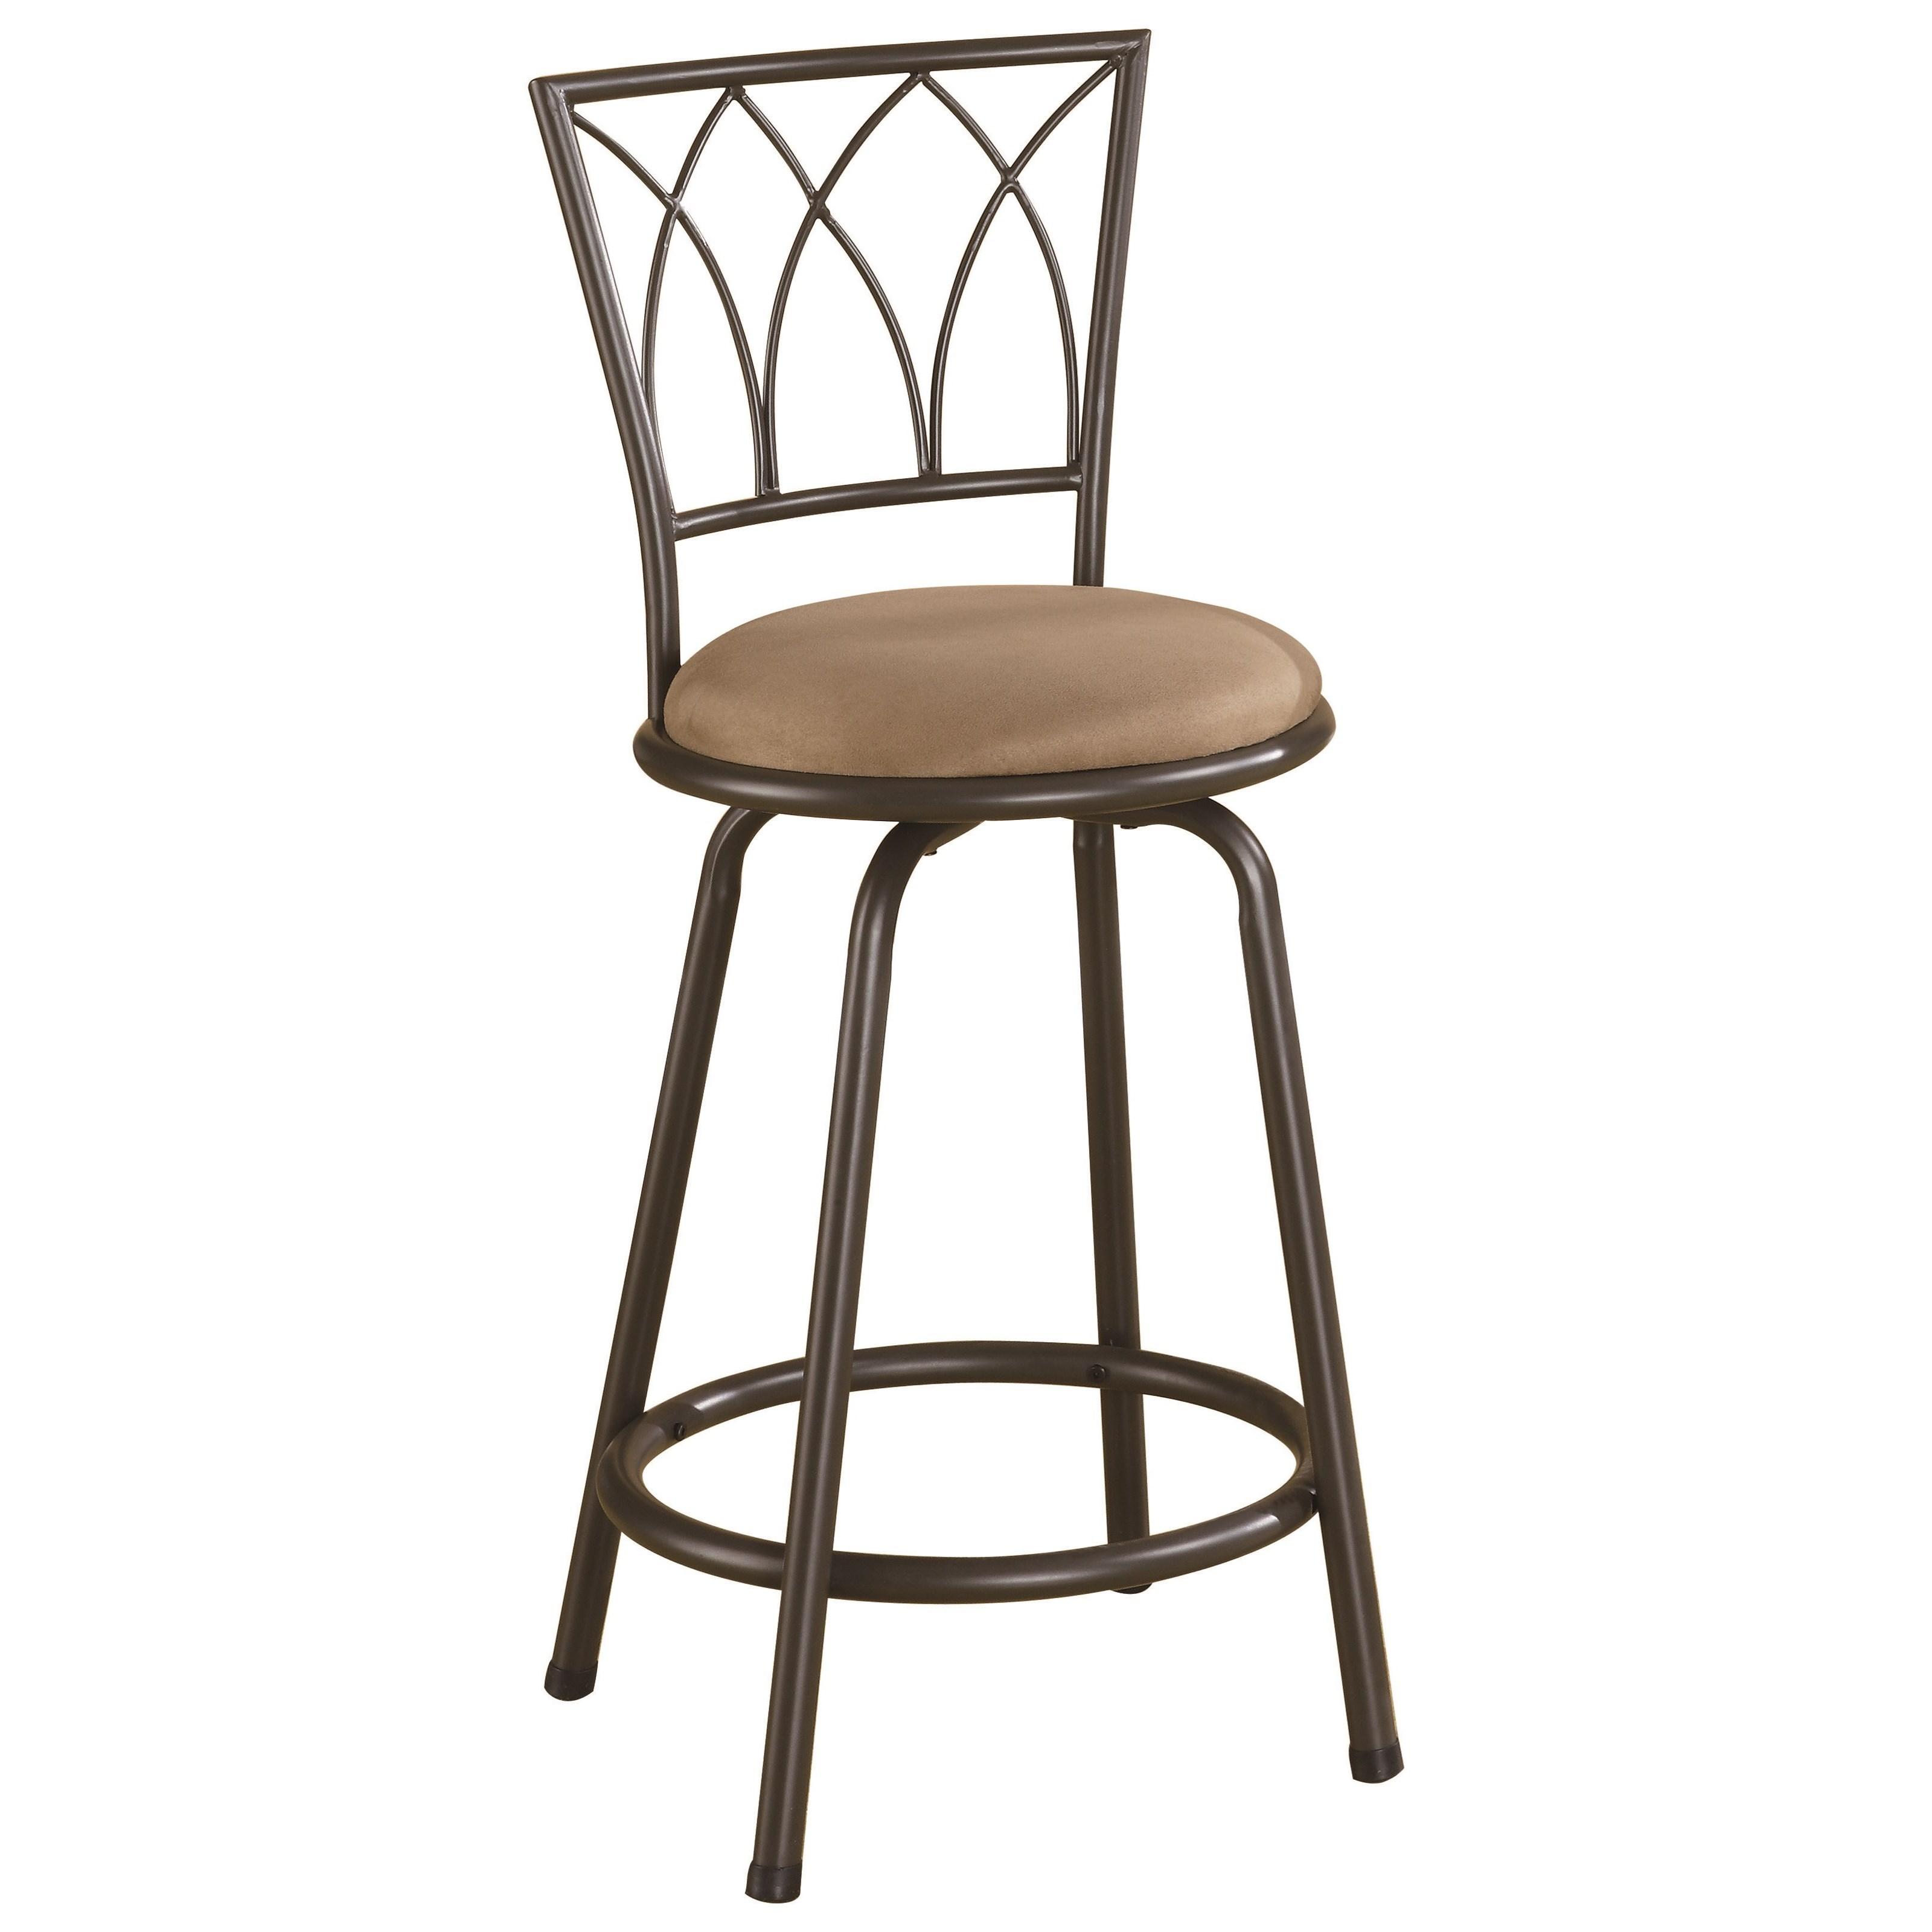 "Coaster Dining Chairs and Bar Stools 24"" Metal Bar Stool - Item Number: 122019"